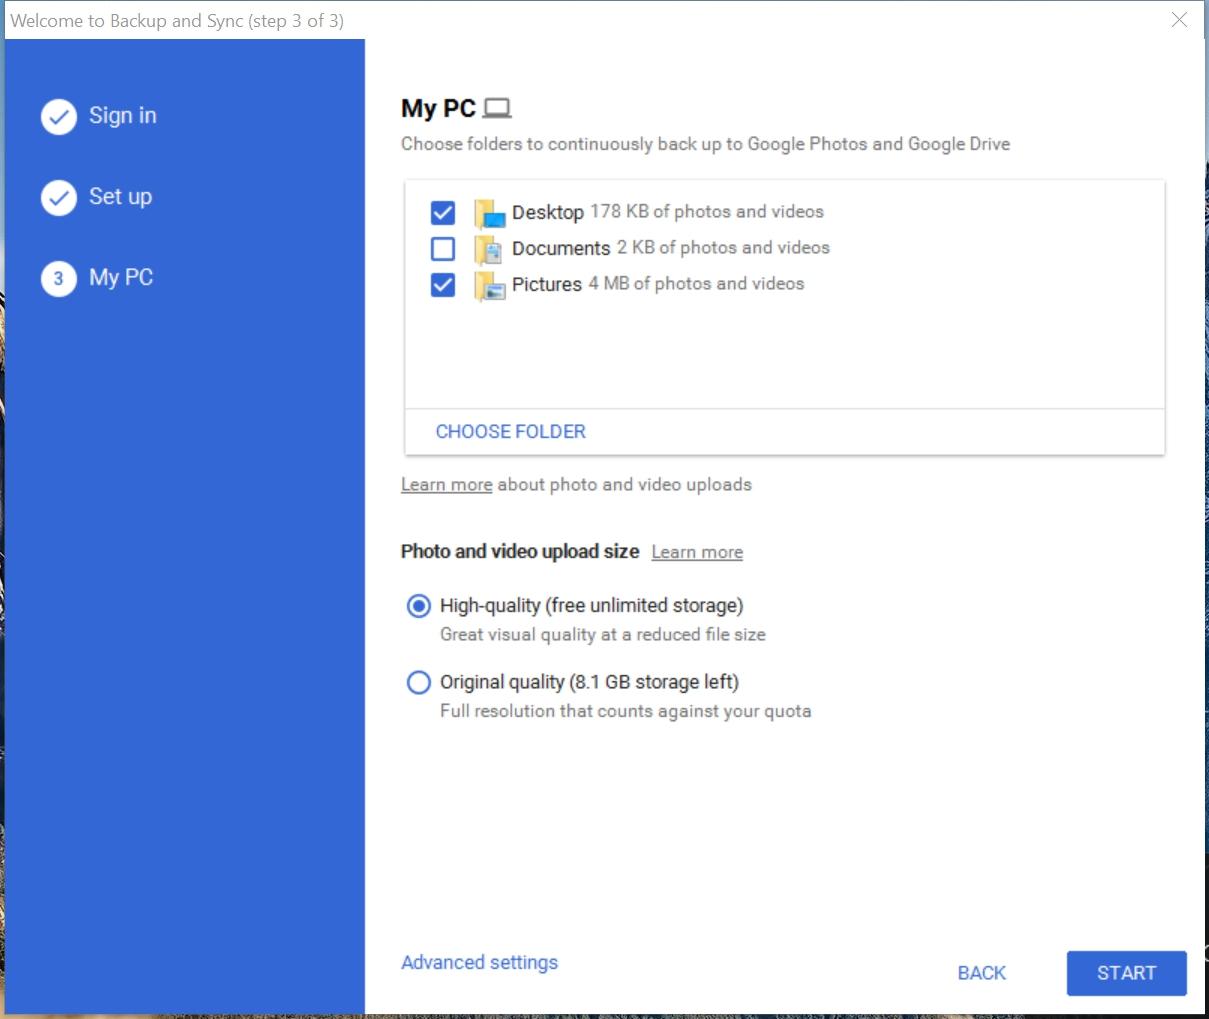 Google_Backup_And_Sync_app_windows_7